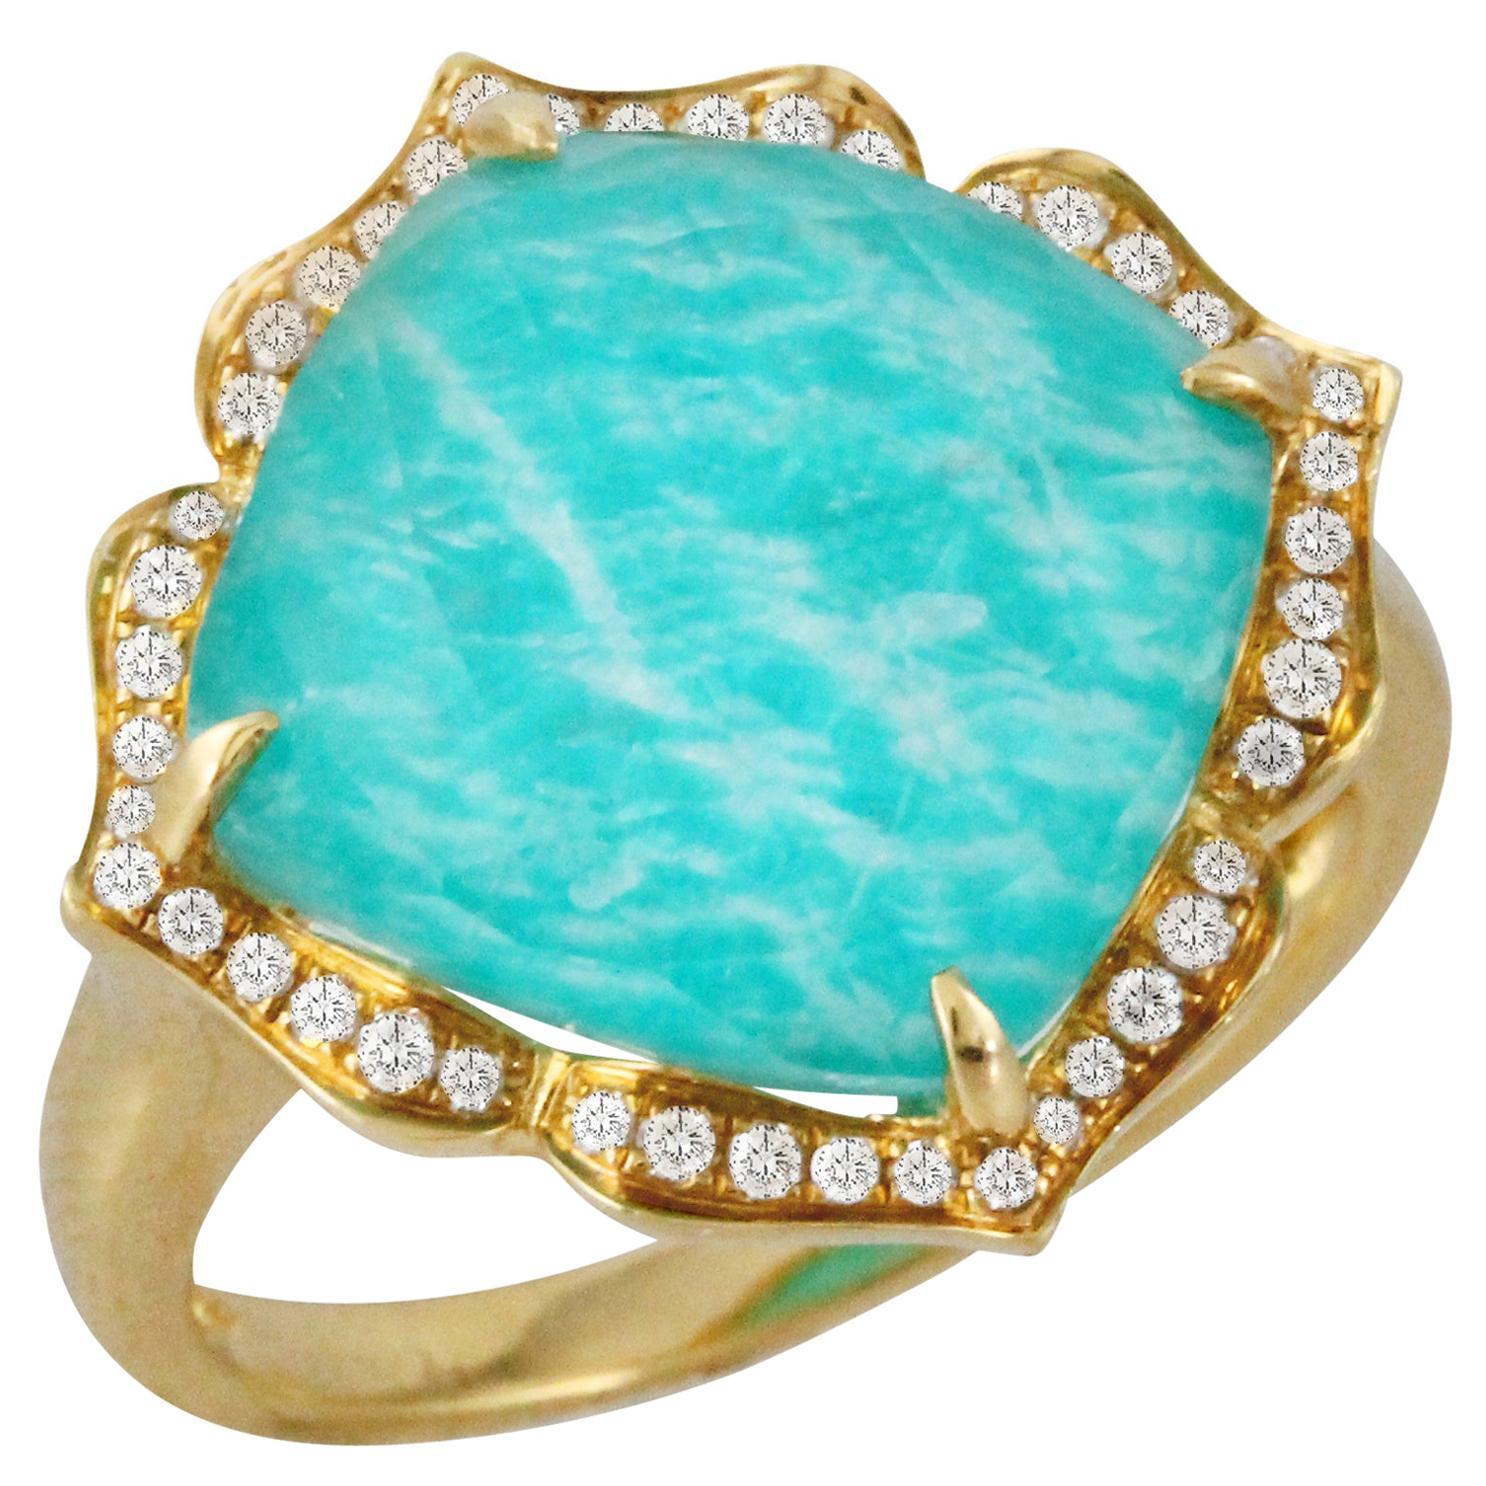 18 Karat Yellow Gold Flower Cocktail Ring w/Amazonite, White Quartz & Diamonds